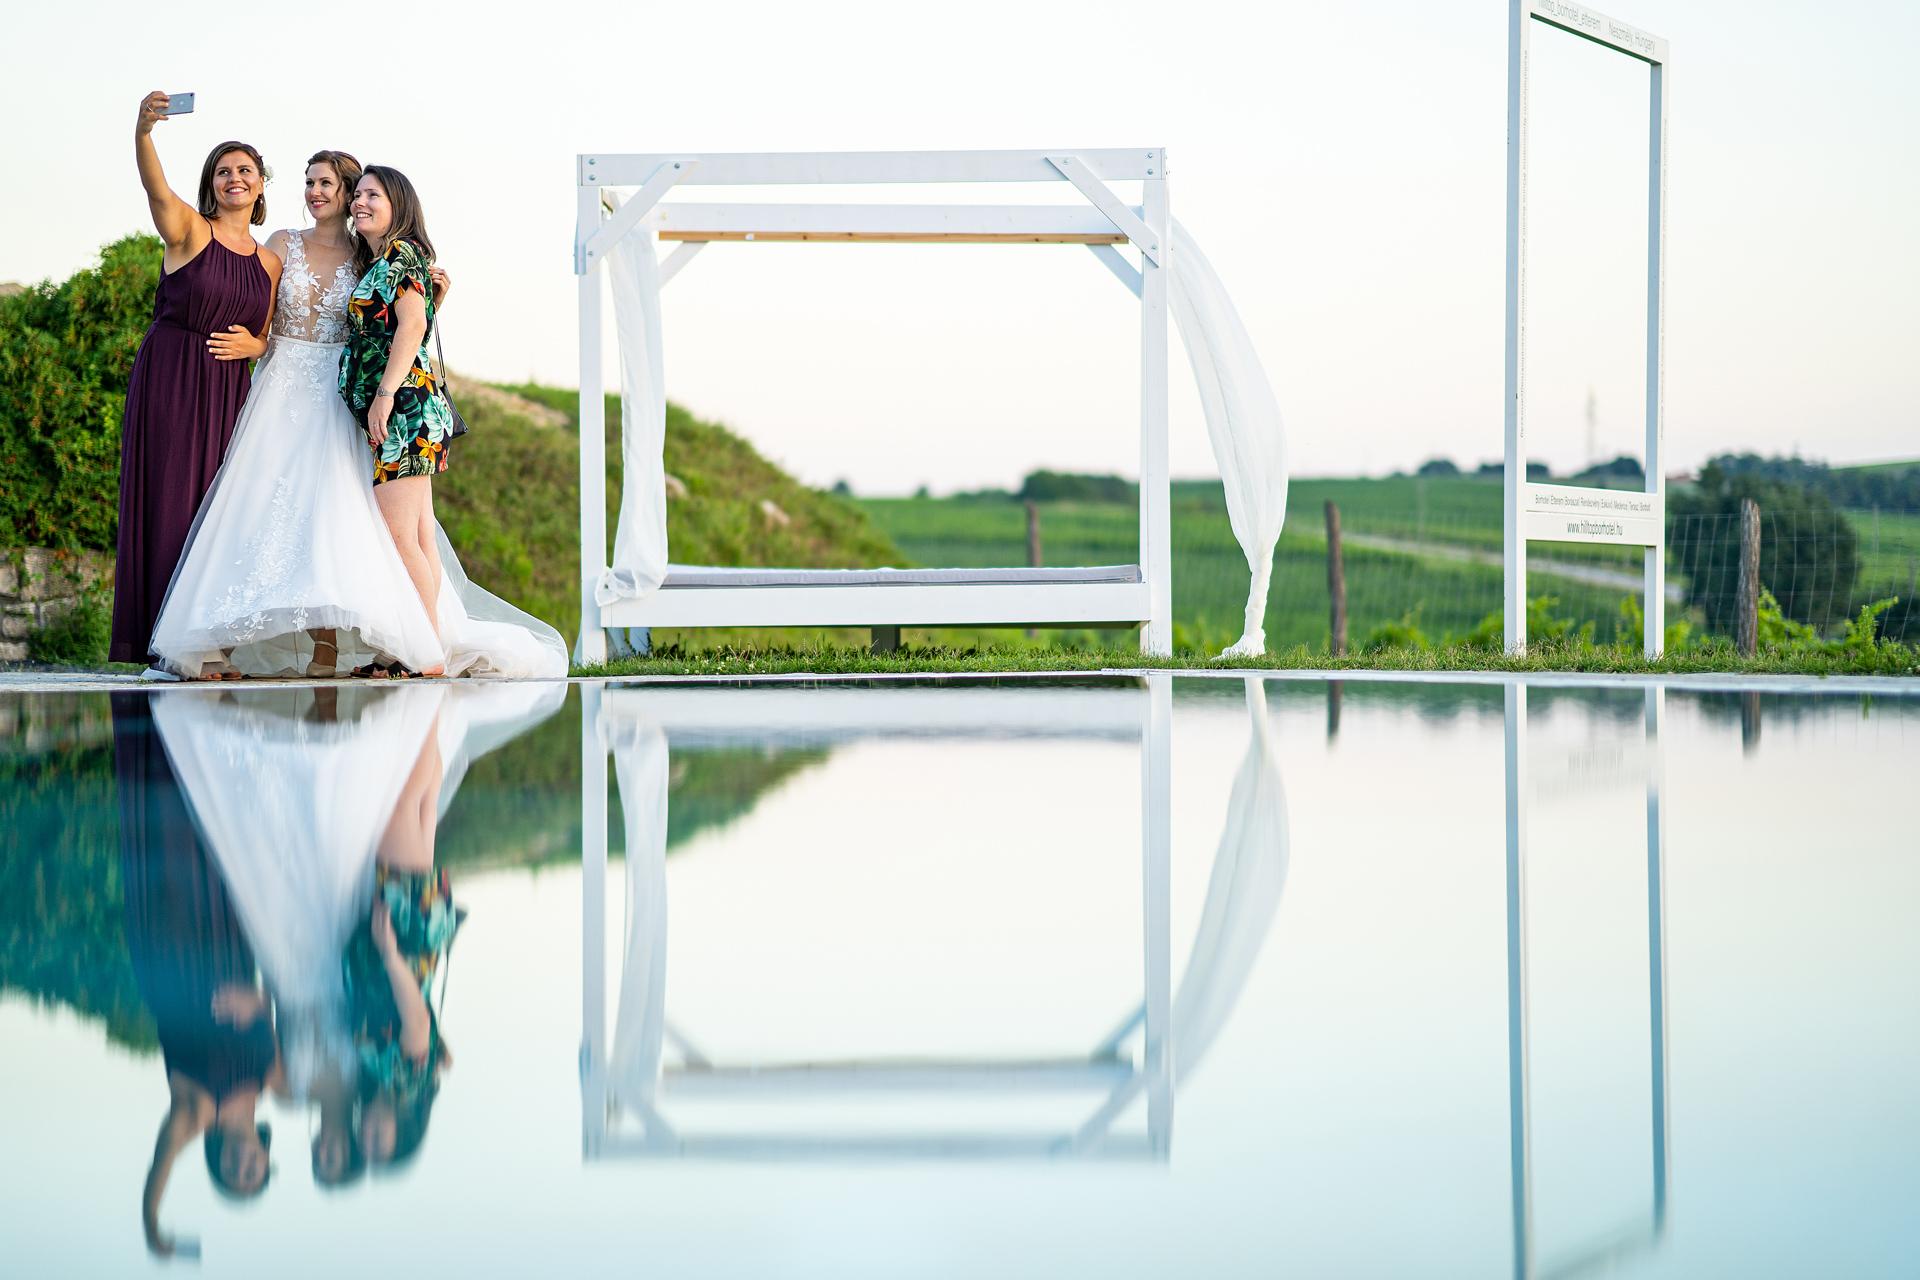 esküvői fotós, purephoto, esküvő, hiltop esküvő